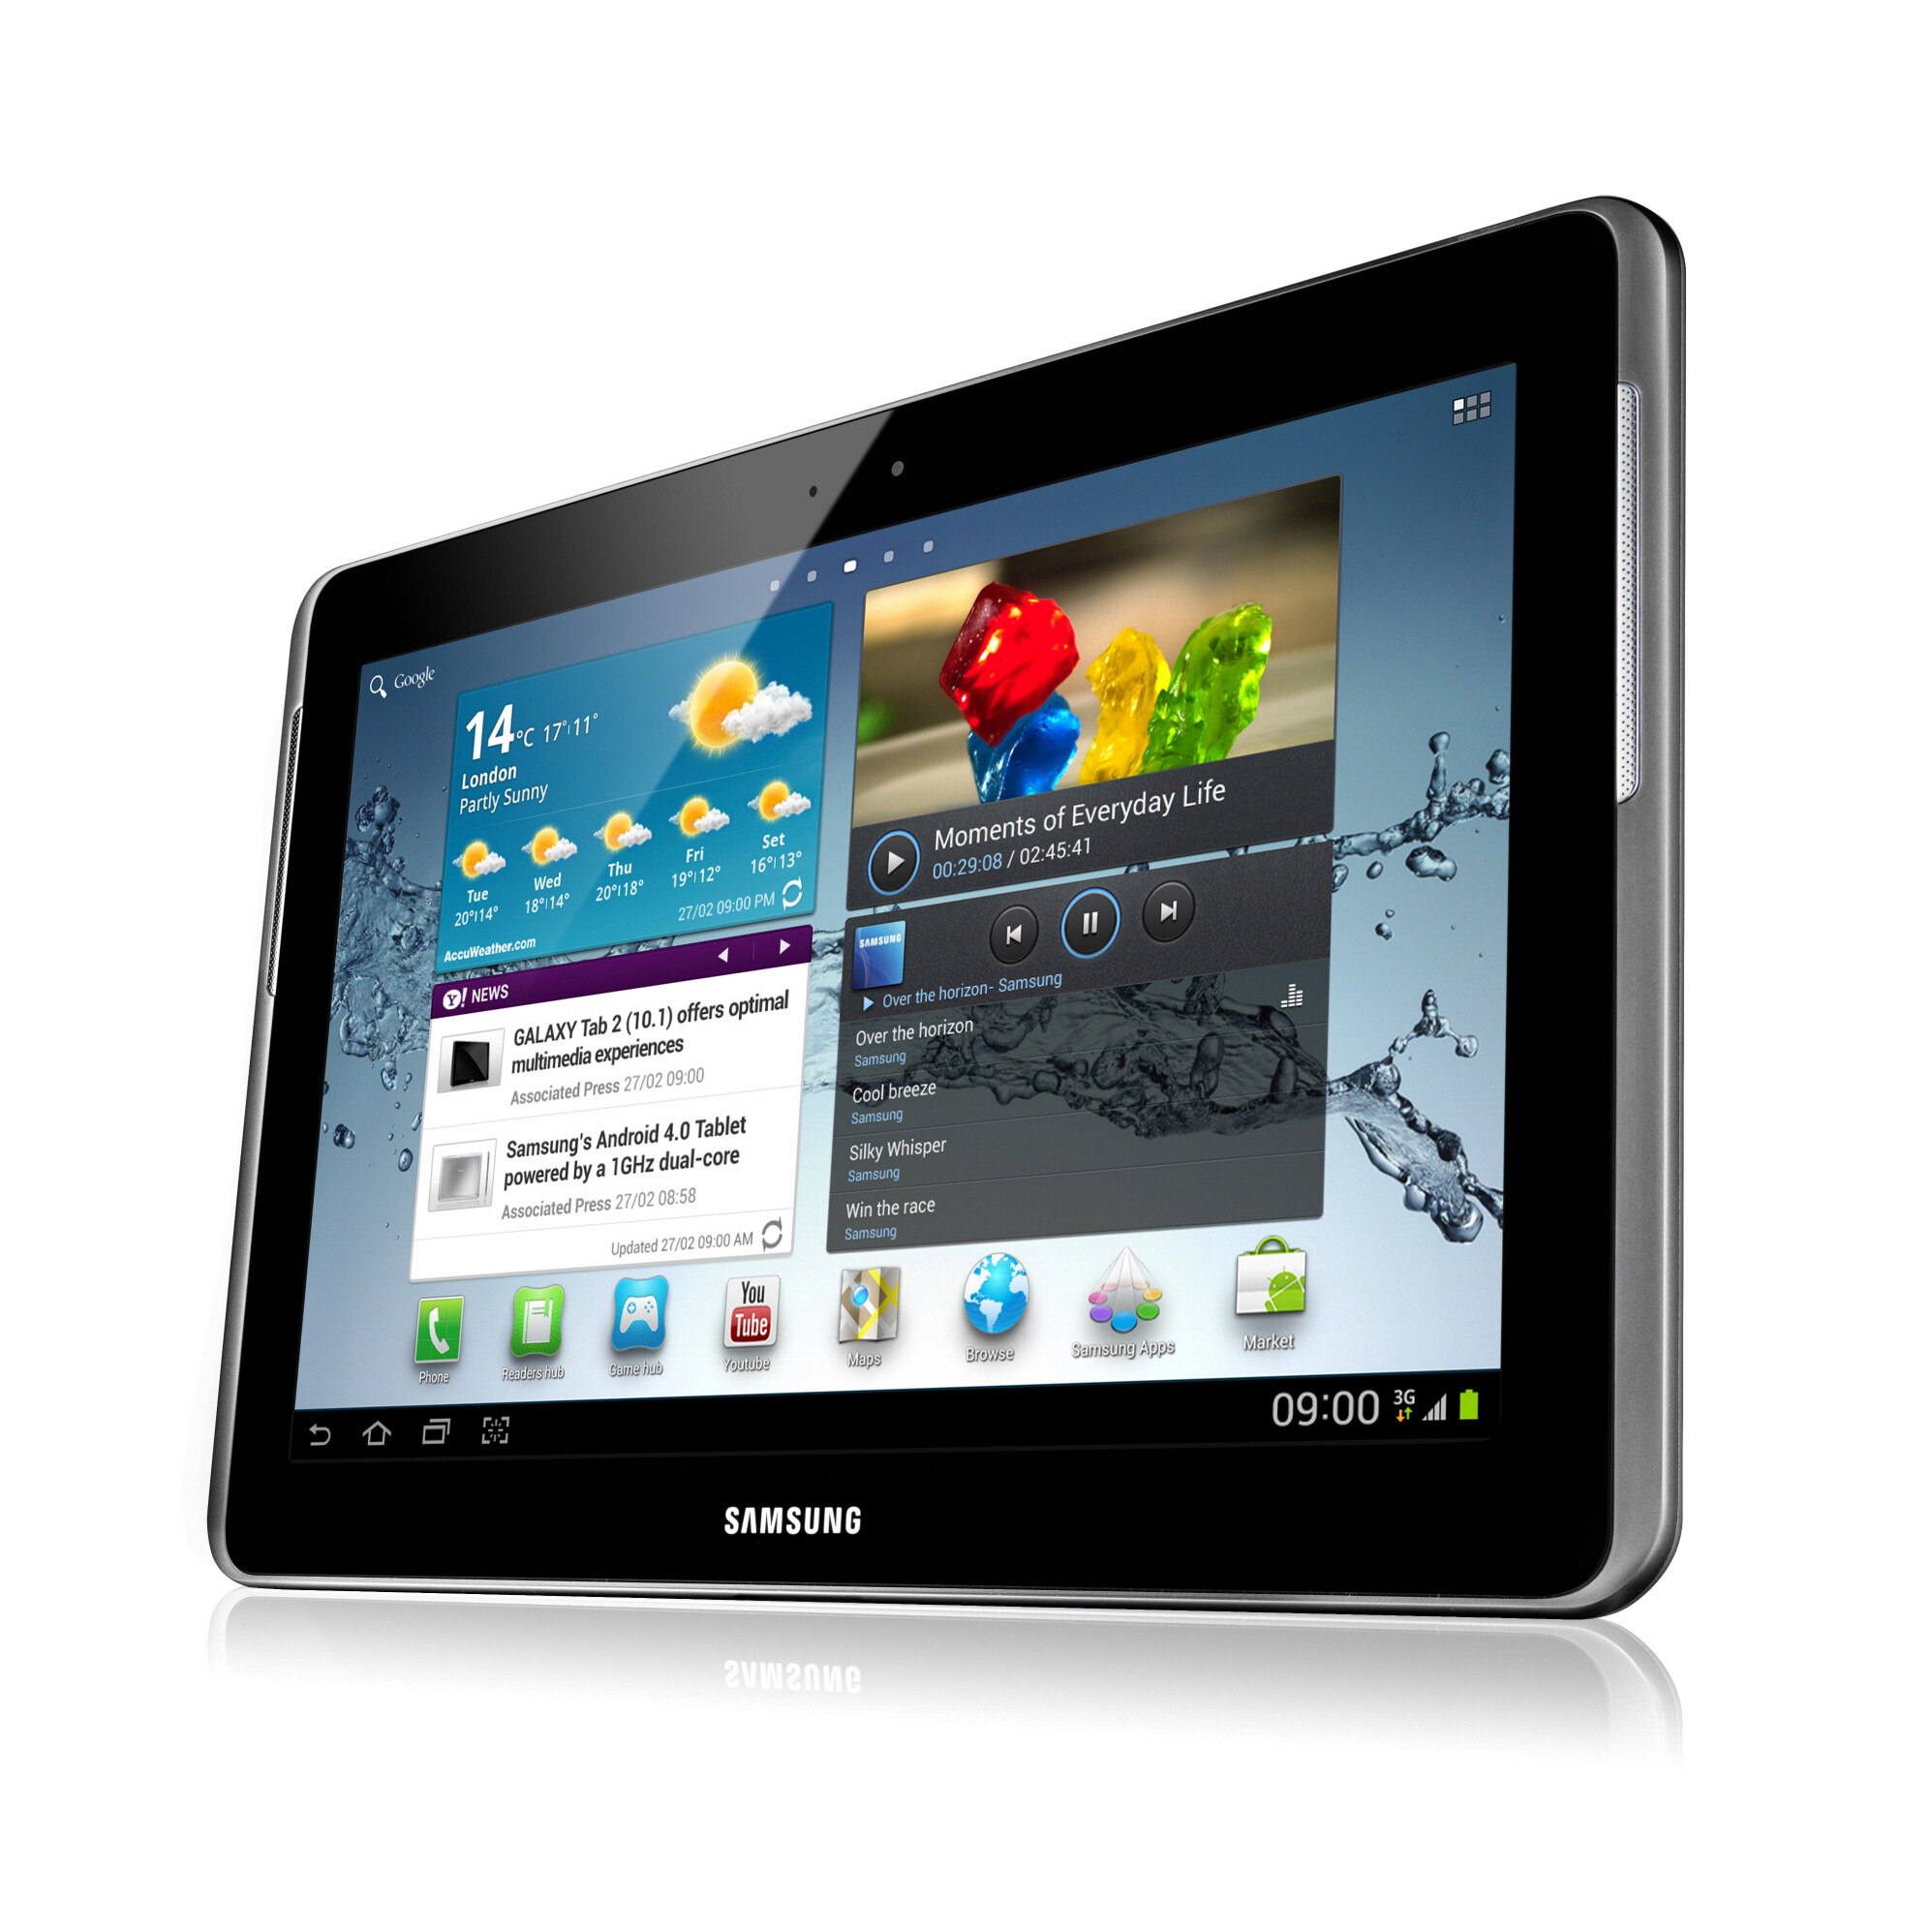 Samsung galaxy tab 2 10 1 specs - Samsung Galaxy Tab 2 10 1 Specs